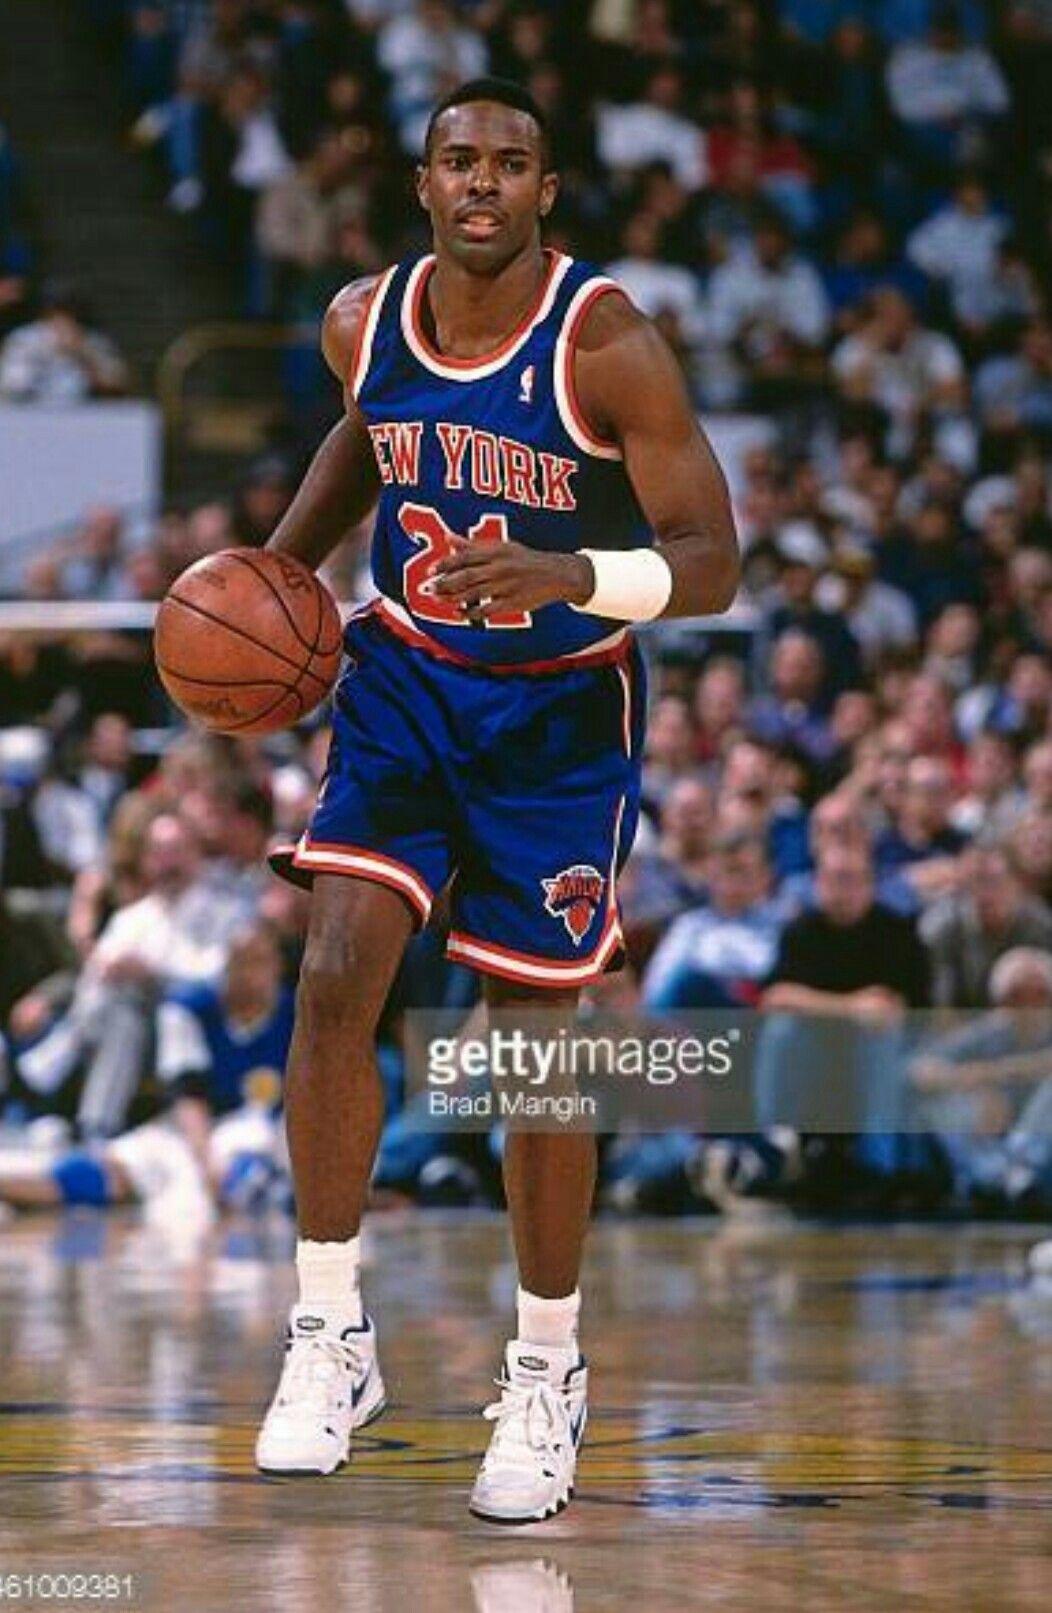 CHARLIE WARD Nba players, Sports basketball, Basketball